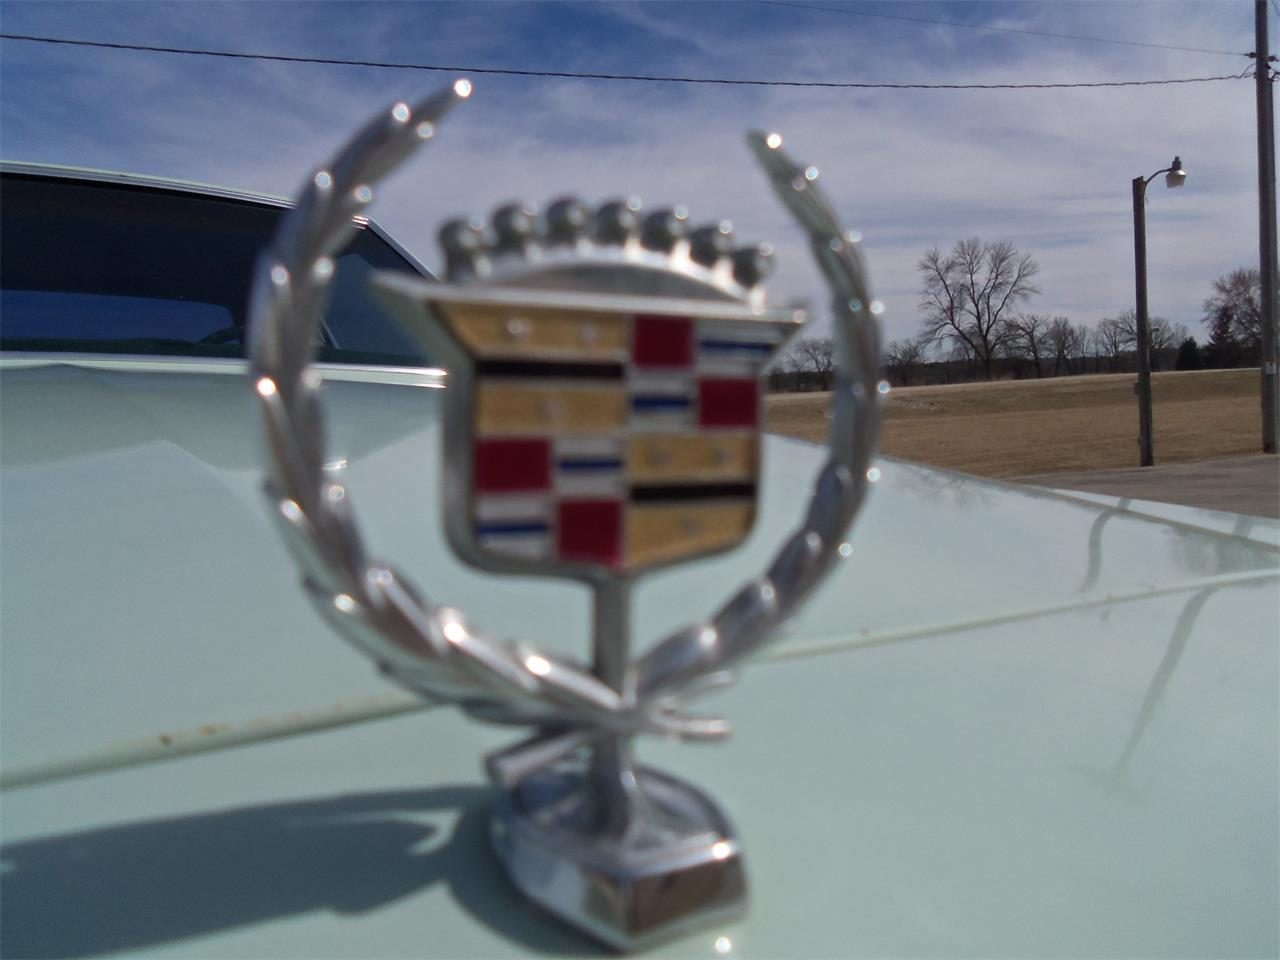 1978 Cadillac Coupe DeVille for Sale | ClassicCars.com ...